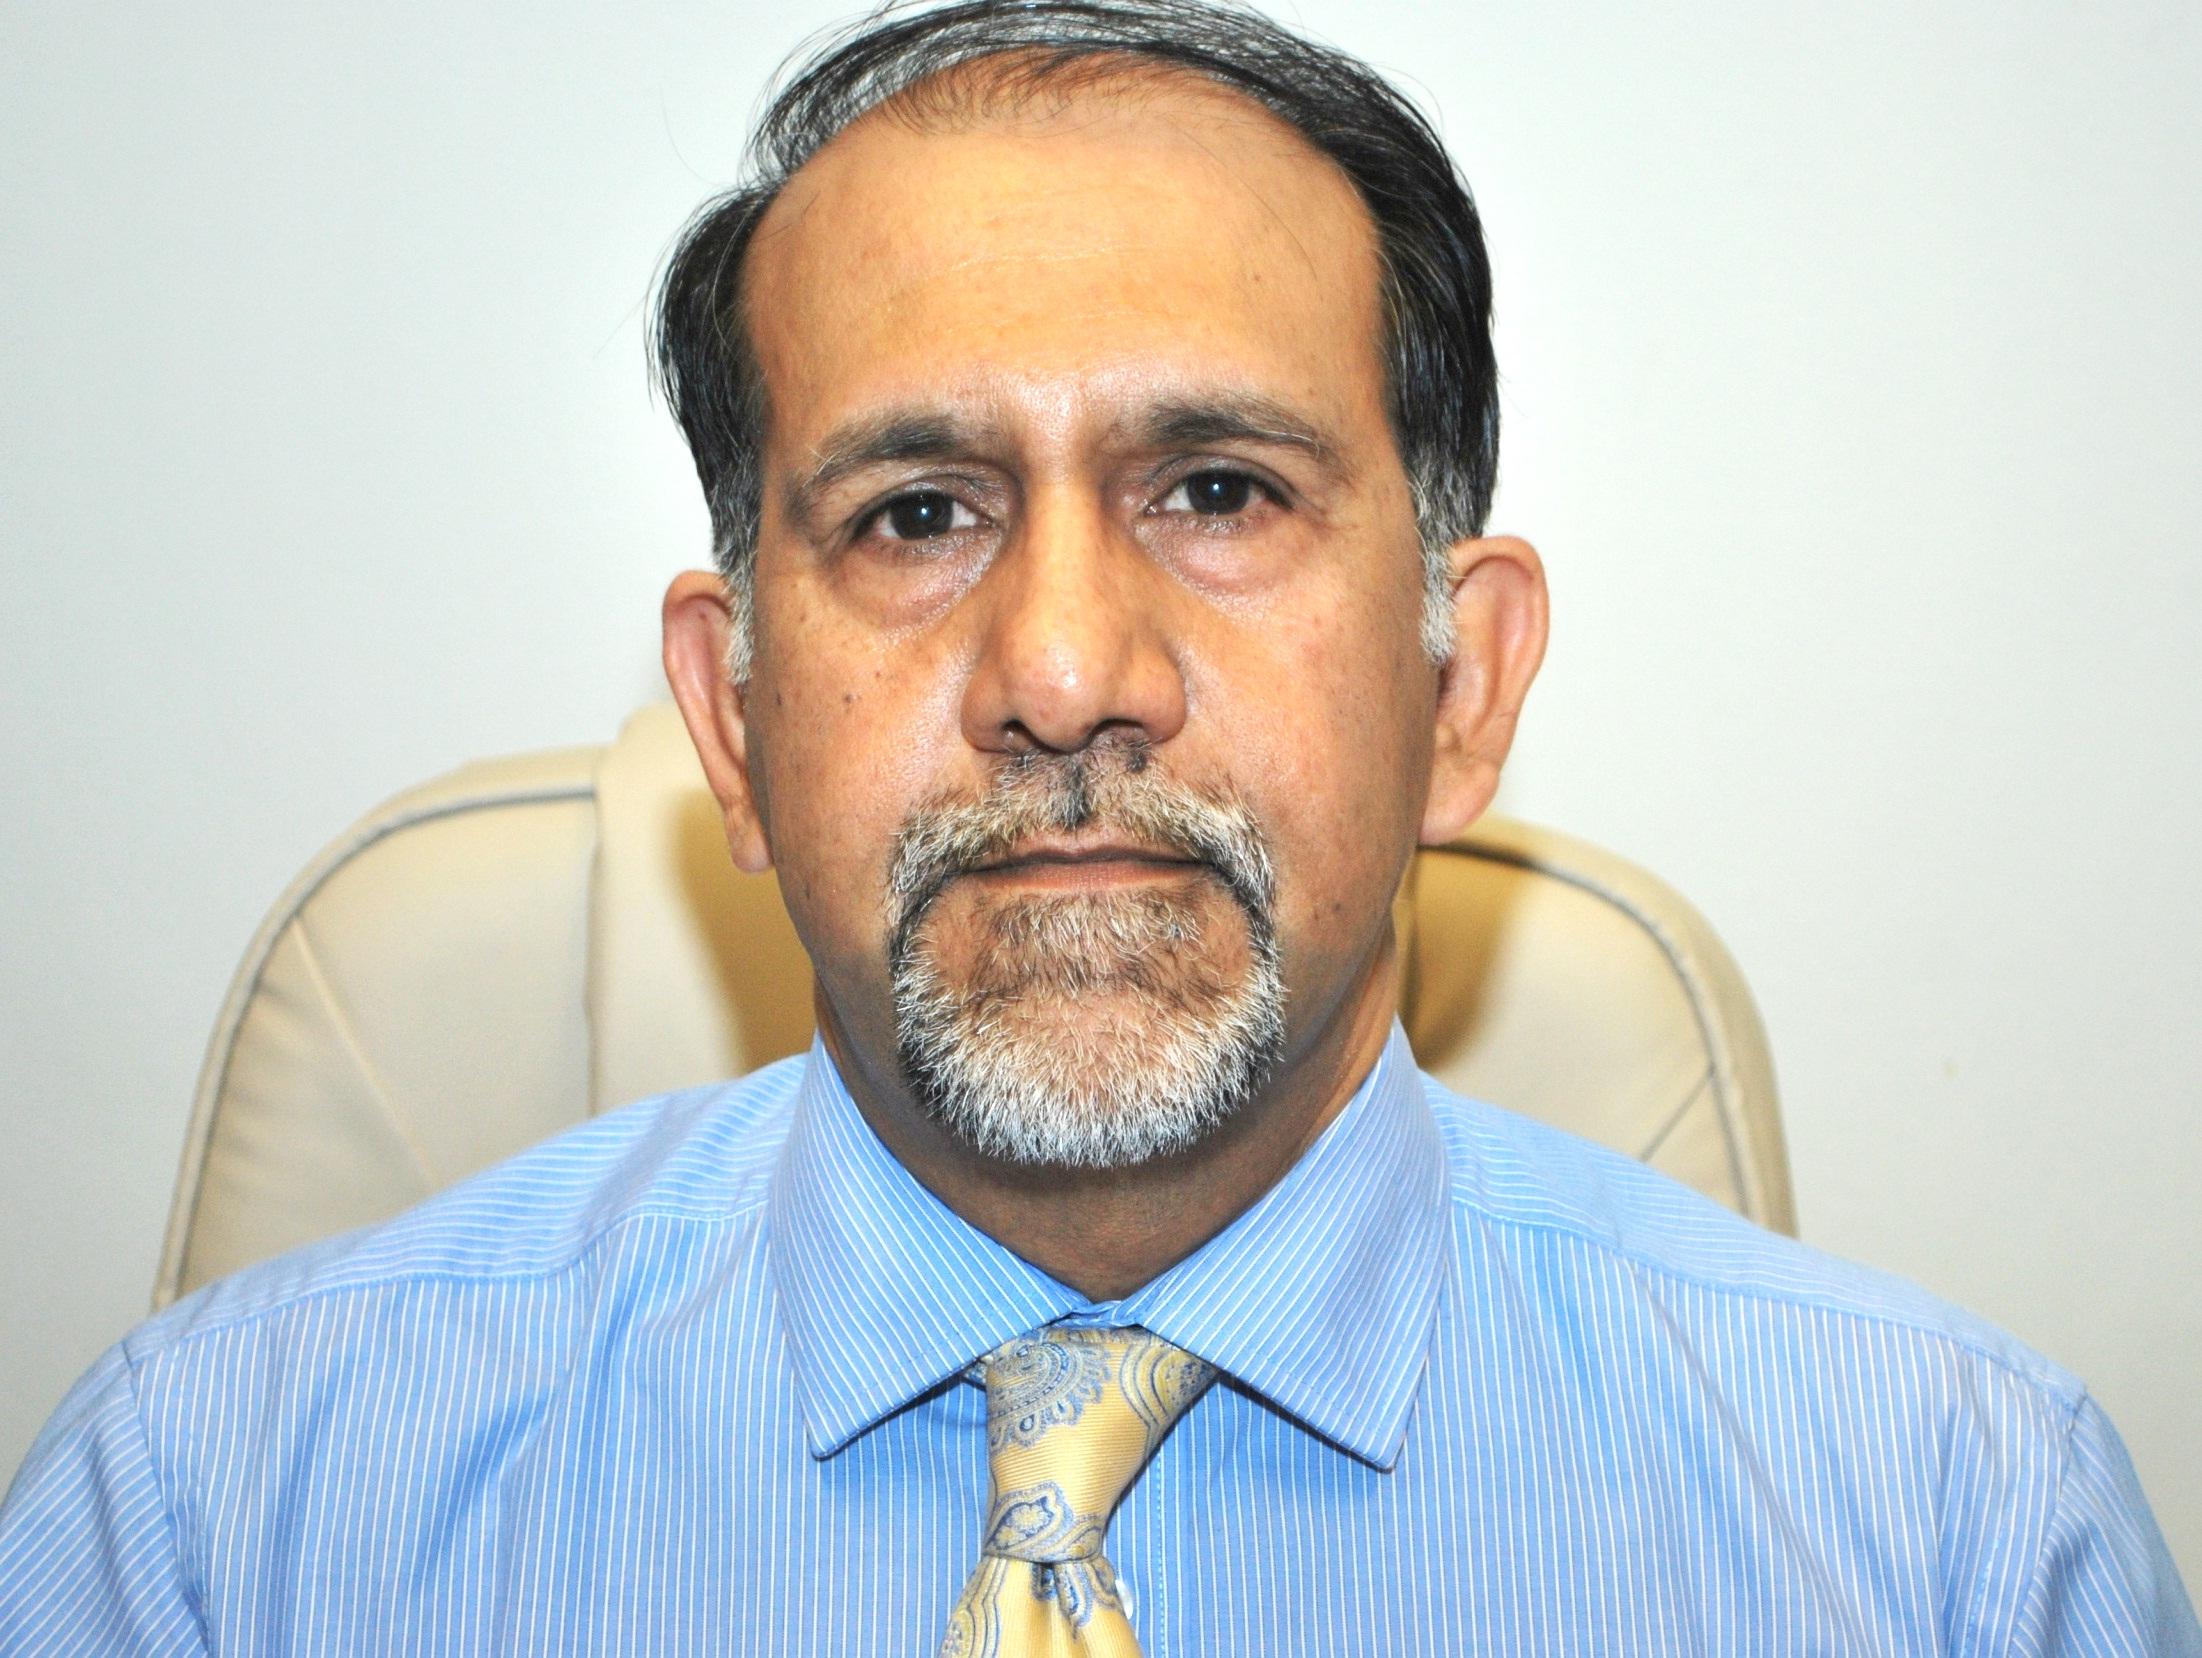 Mamoon Rashid Best Cosmetic Surgeon In Pakistan